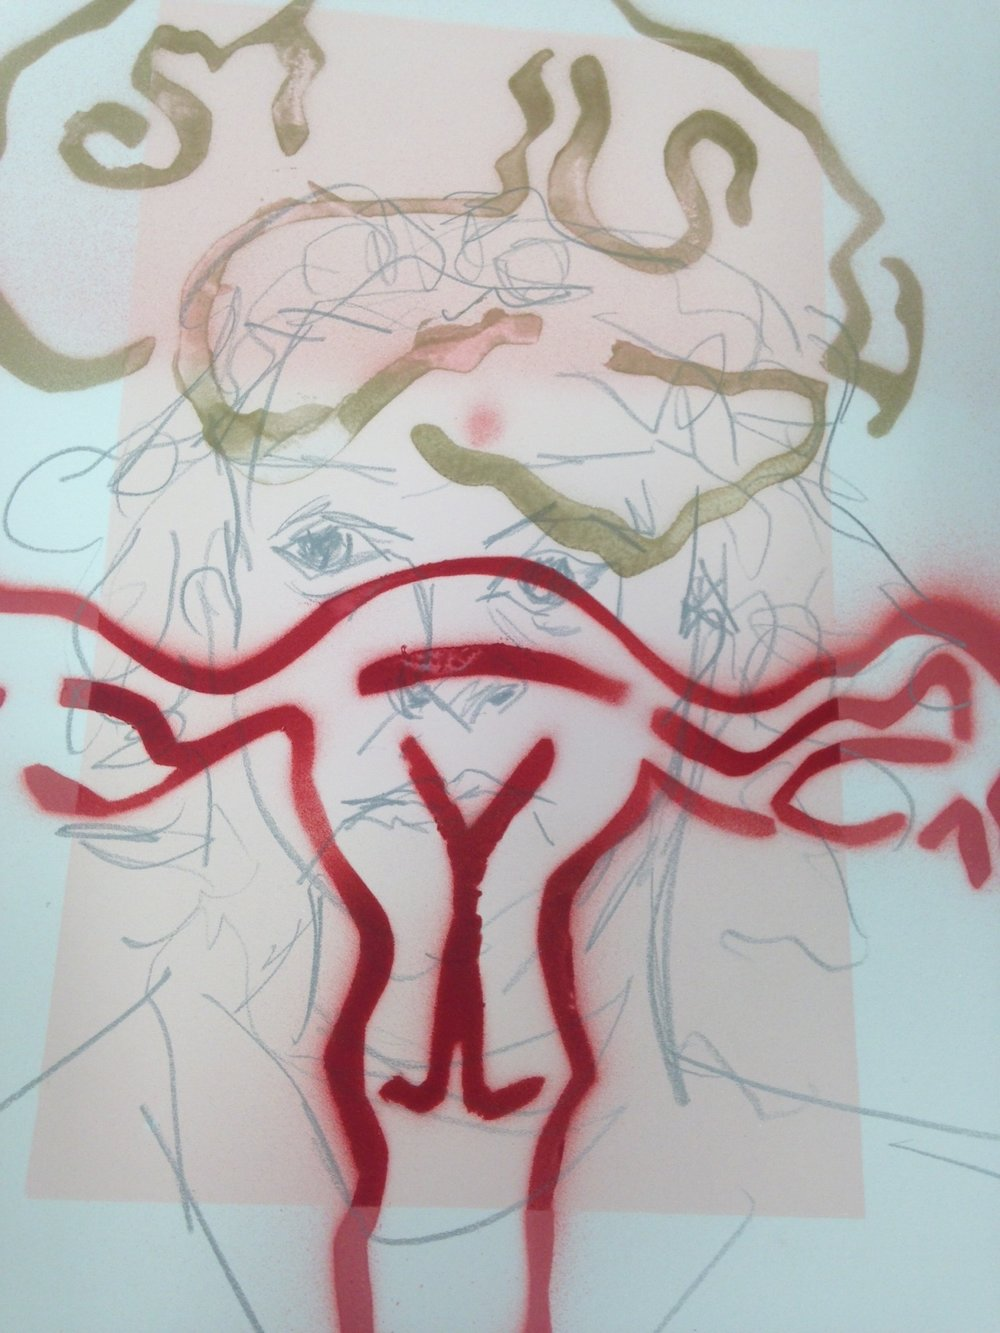 self portrait with uterus.JPG